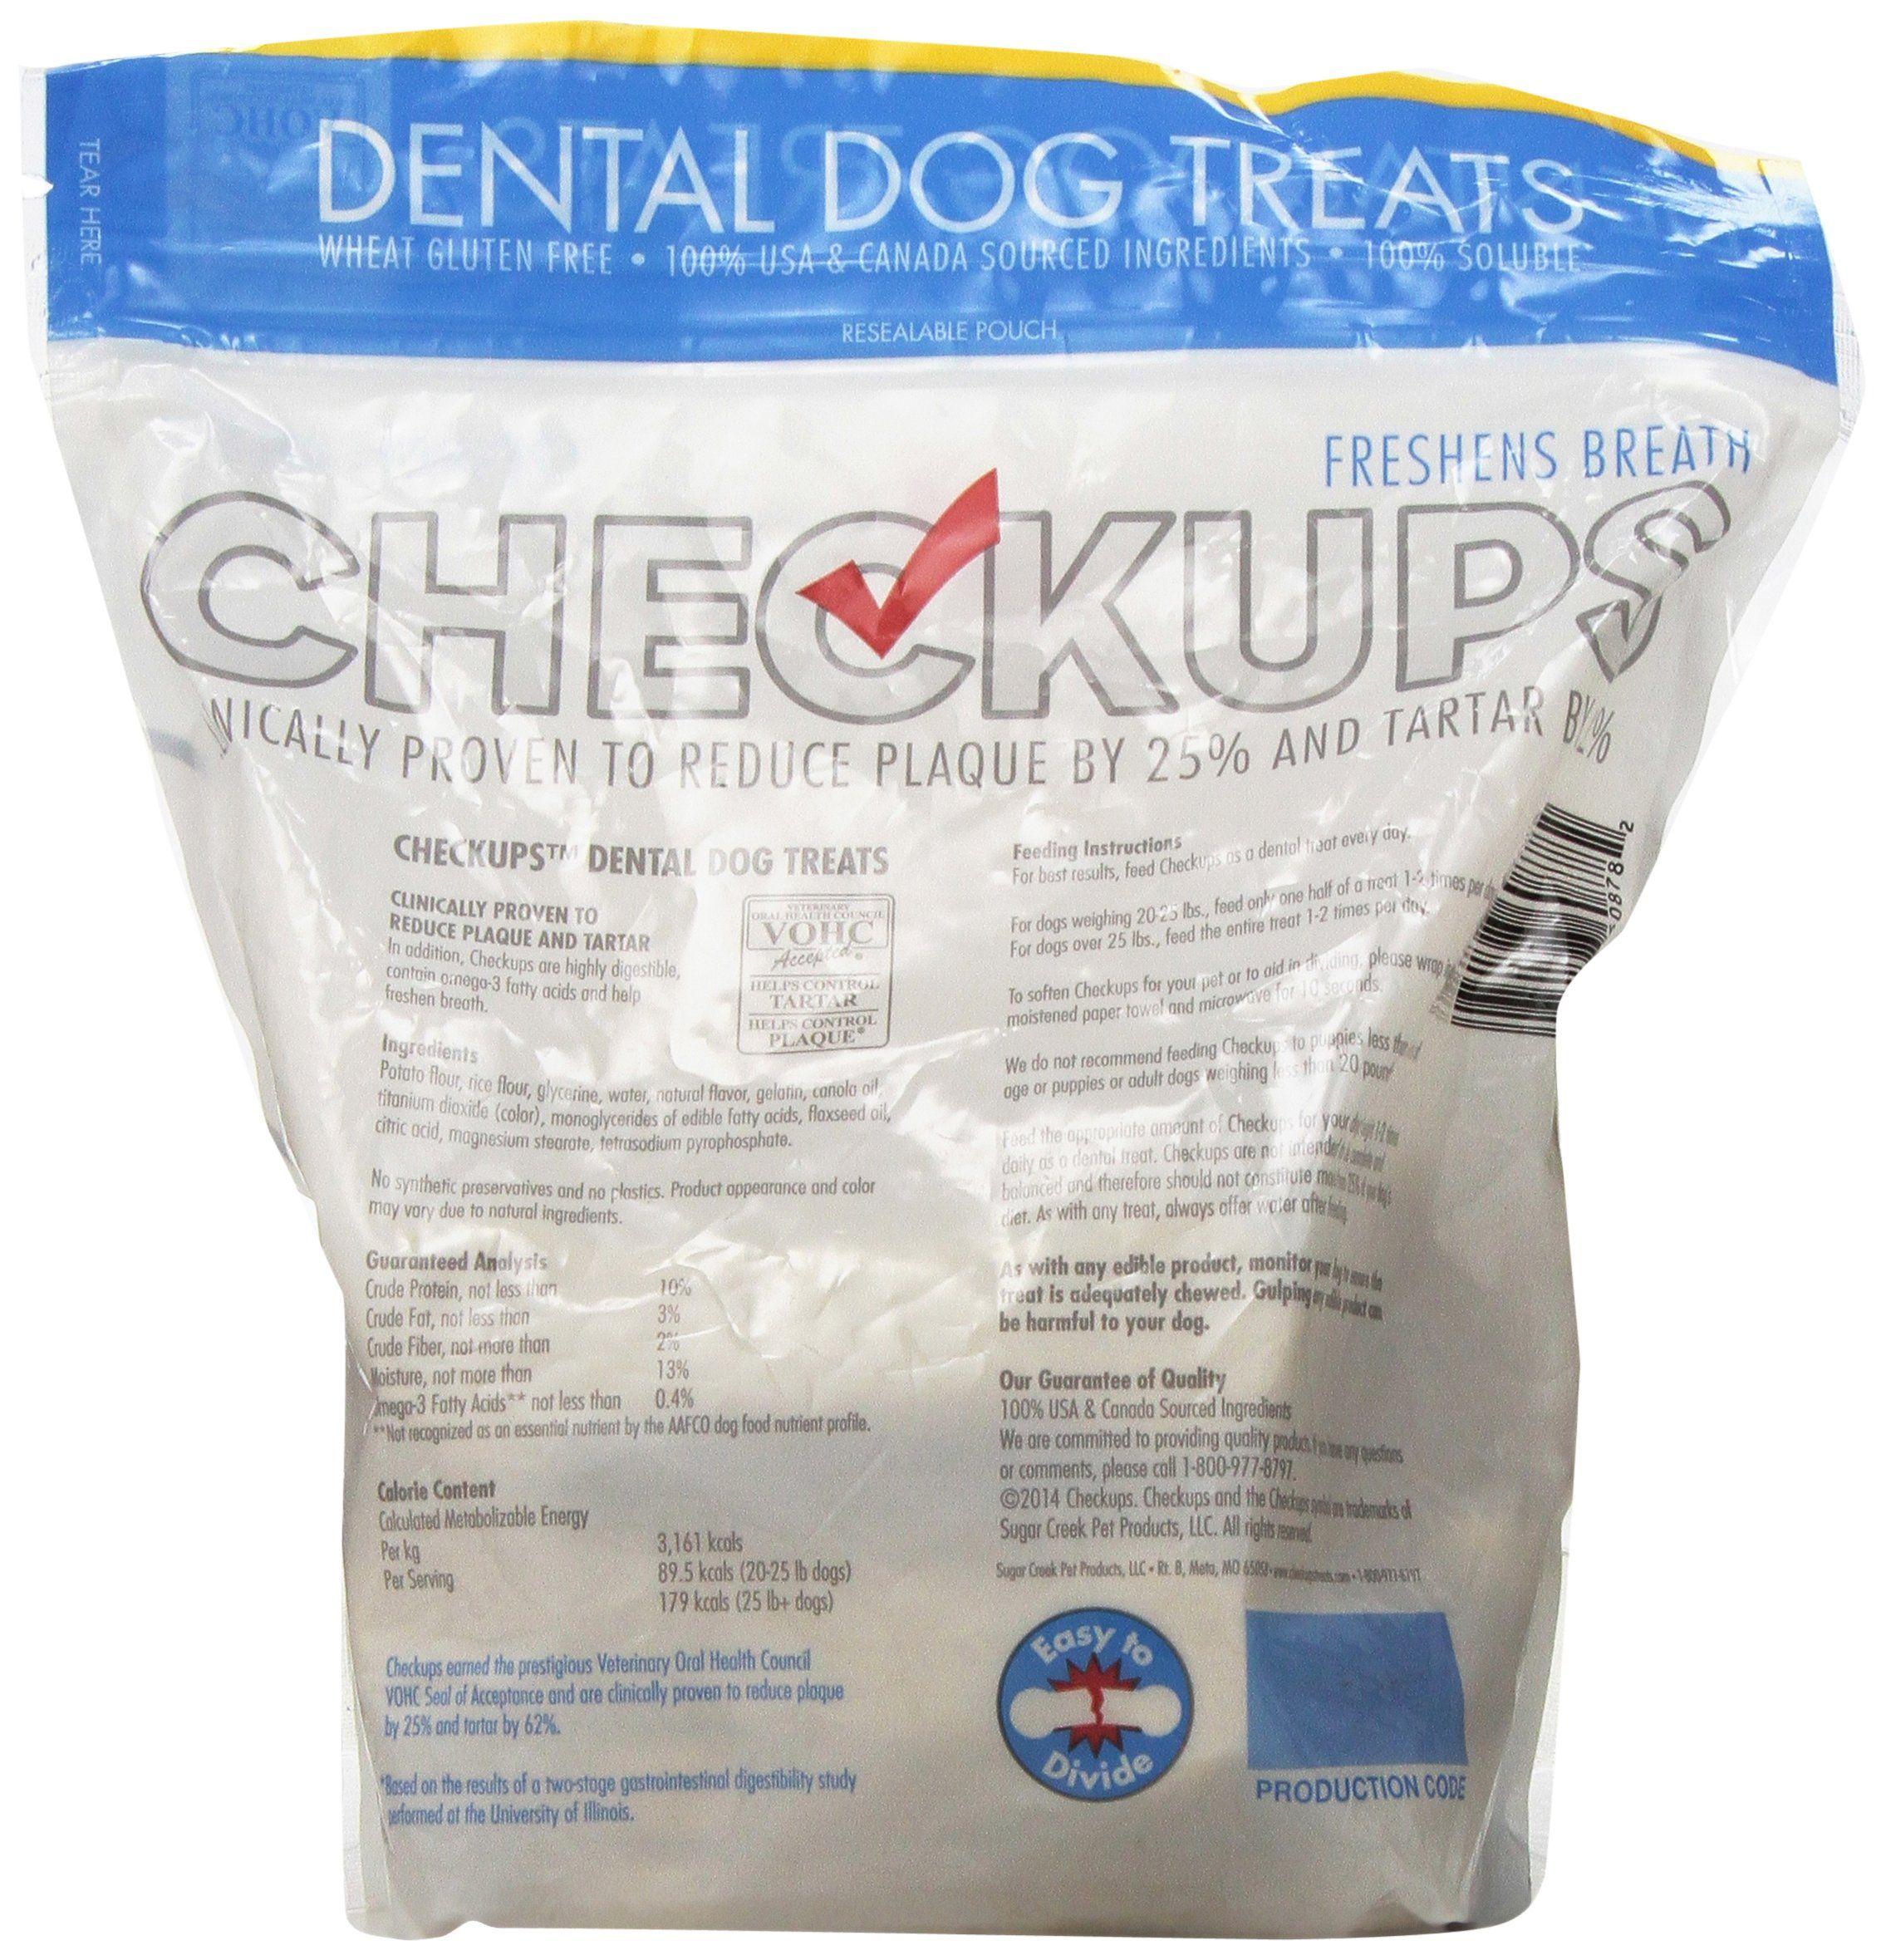 Checkups Dental Dog Treats 24ct 48 oz. for dogs 20 pounds